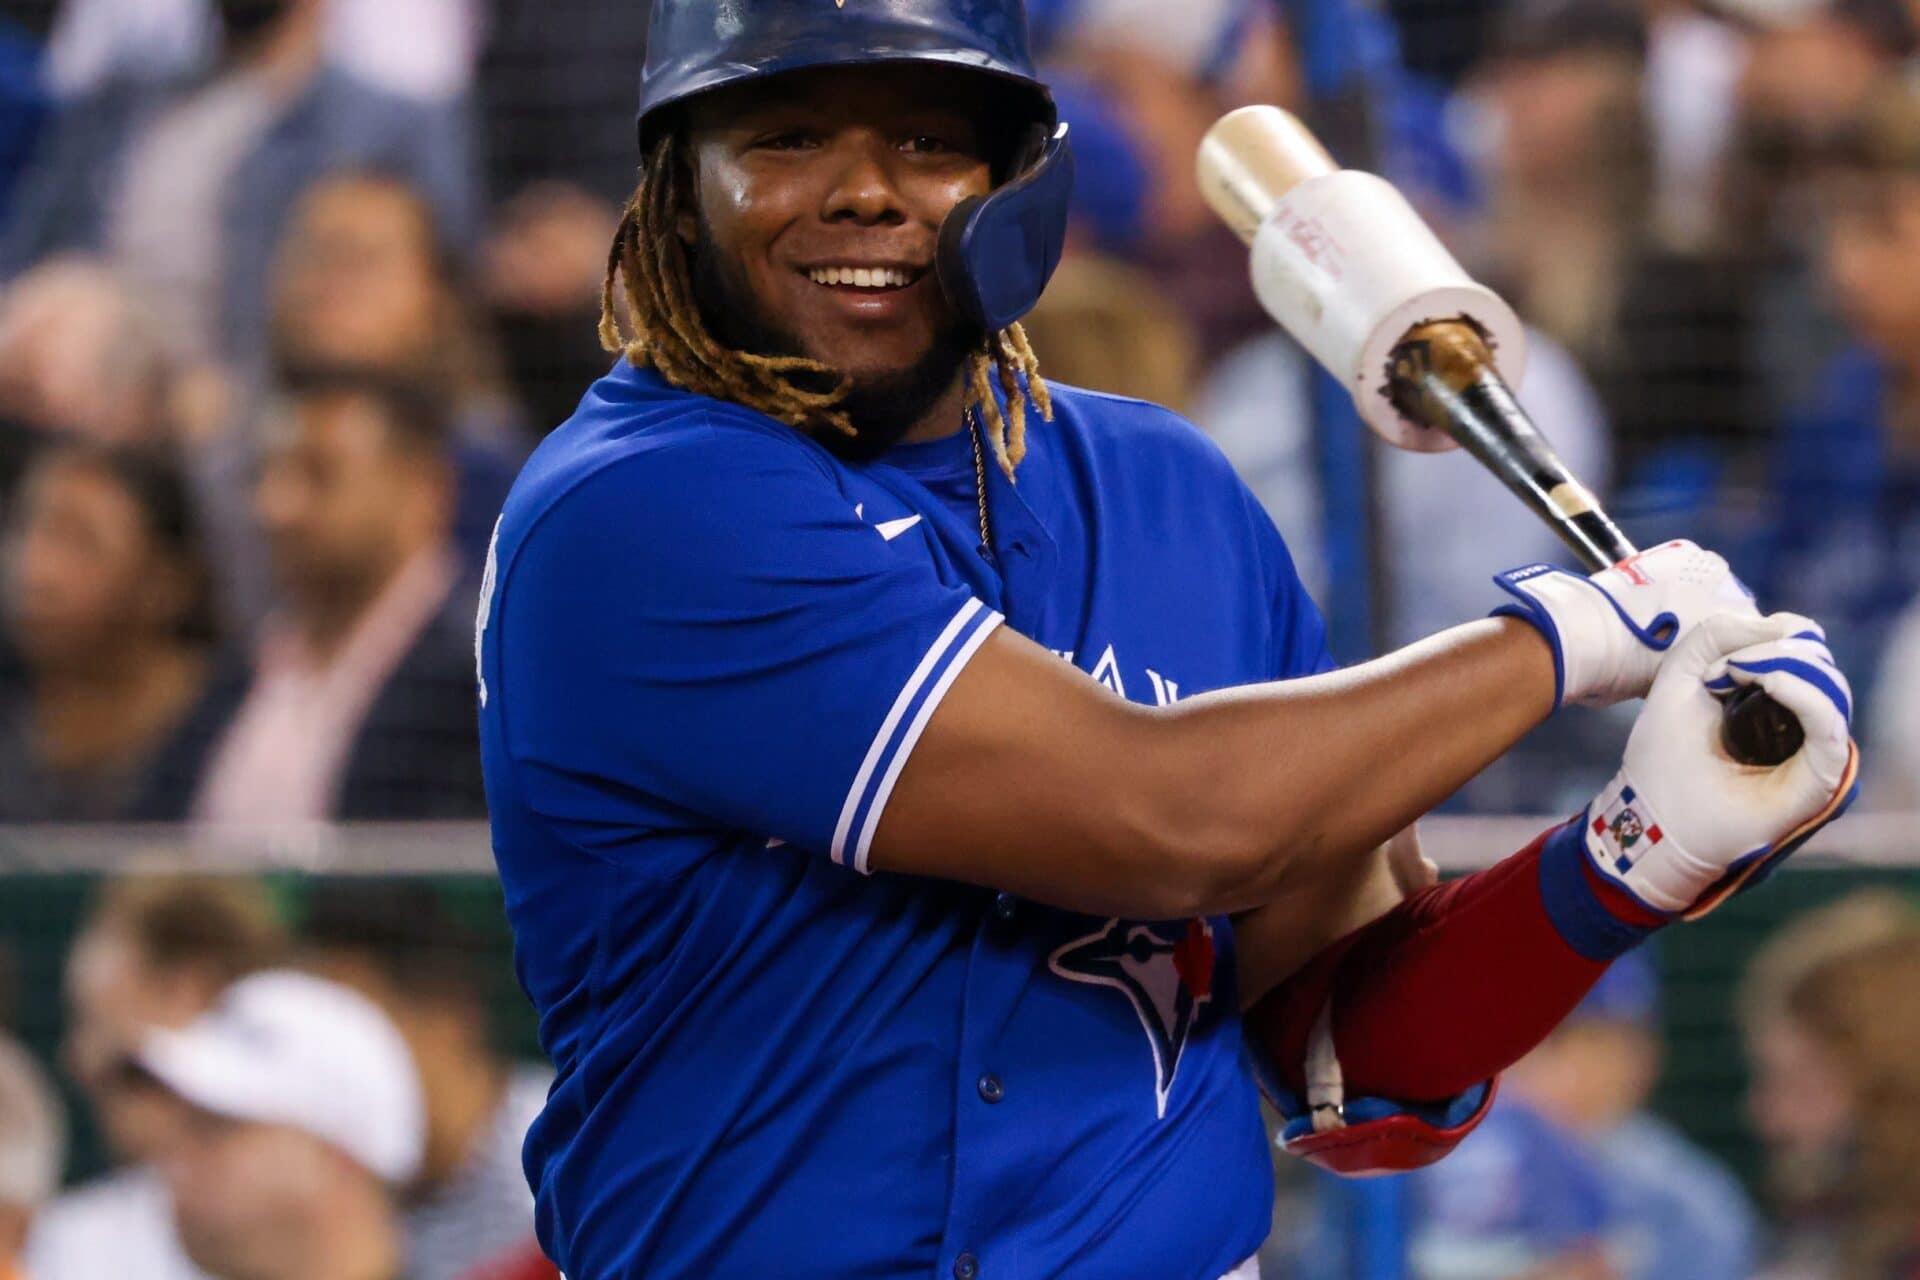 A man in a blue baseball uniform swinging a bat.